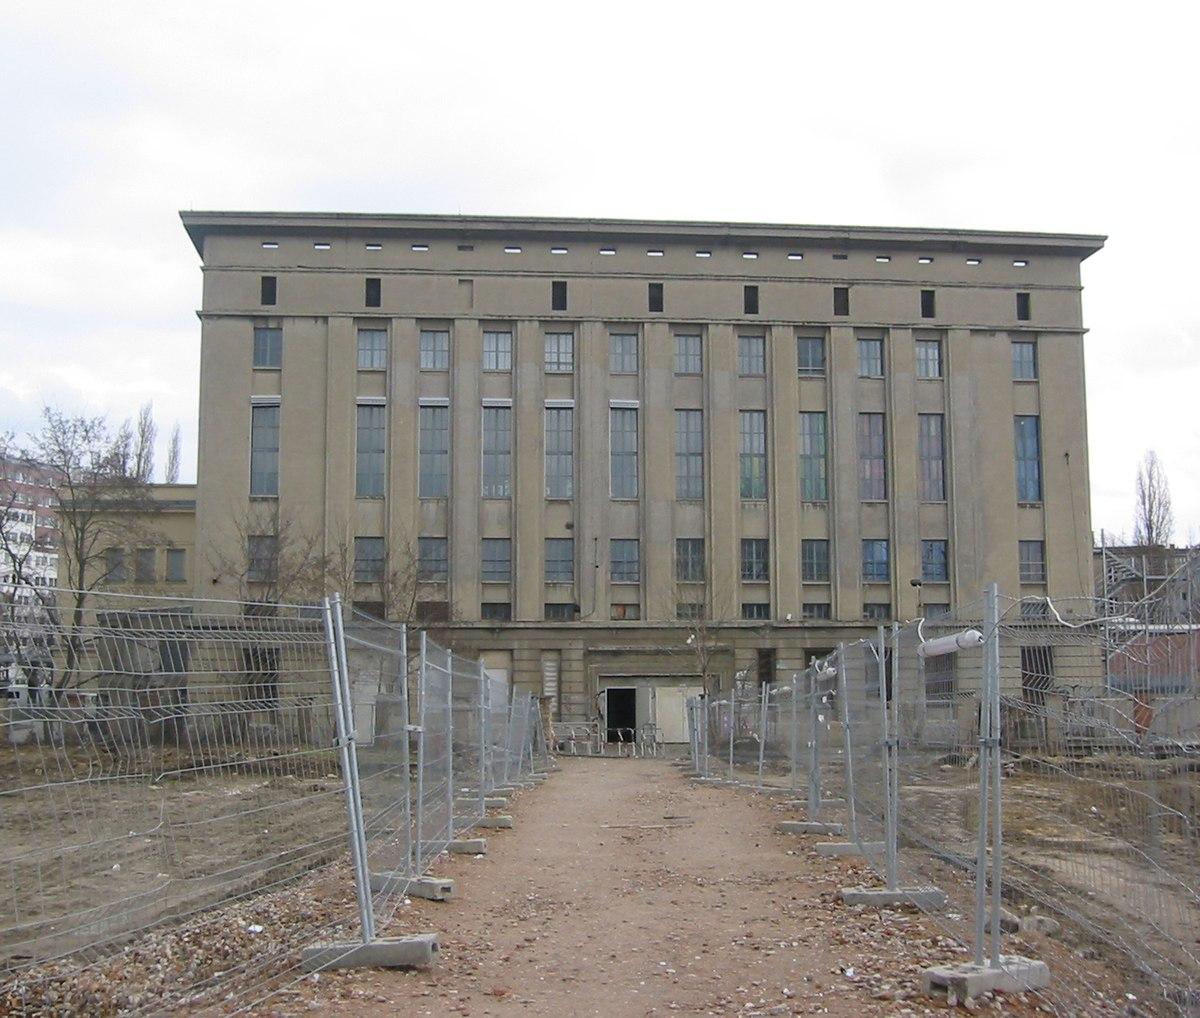 Berghain i Berlin levende sexe